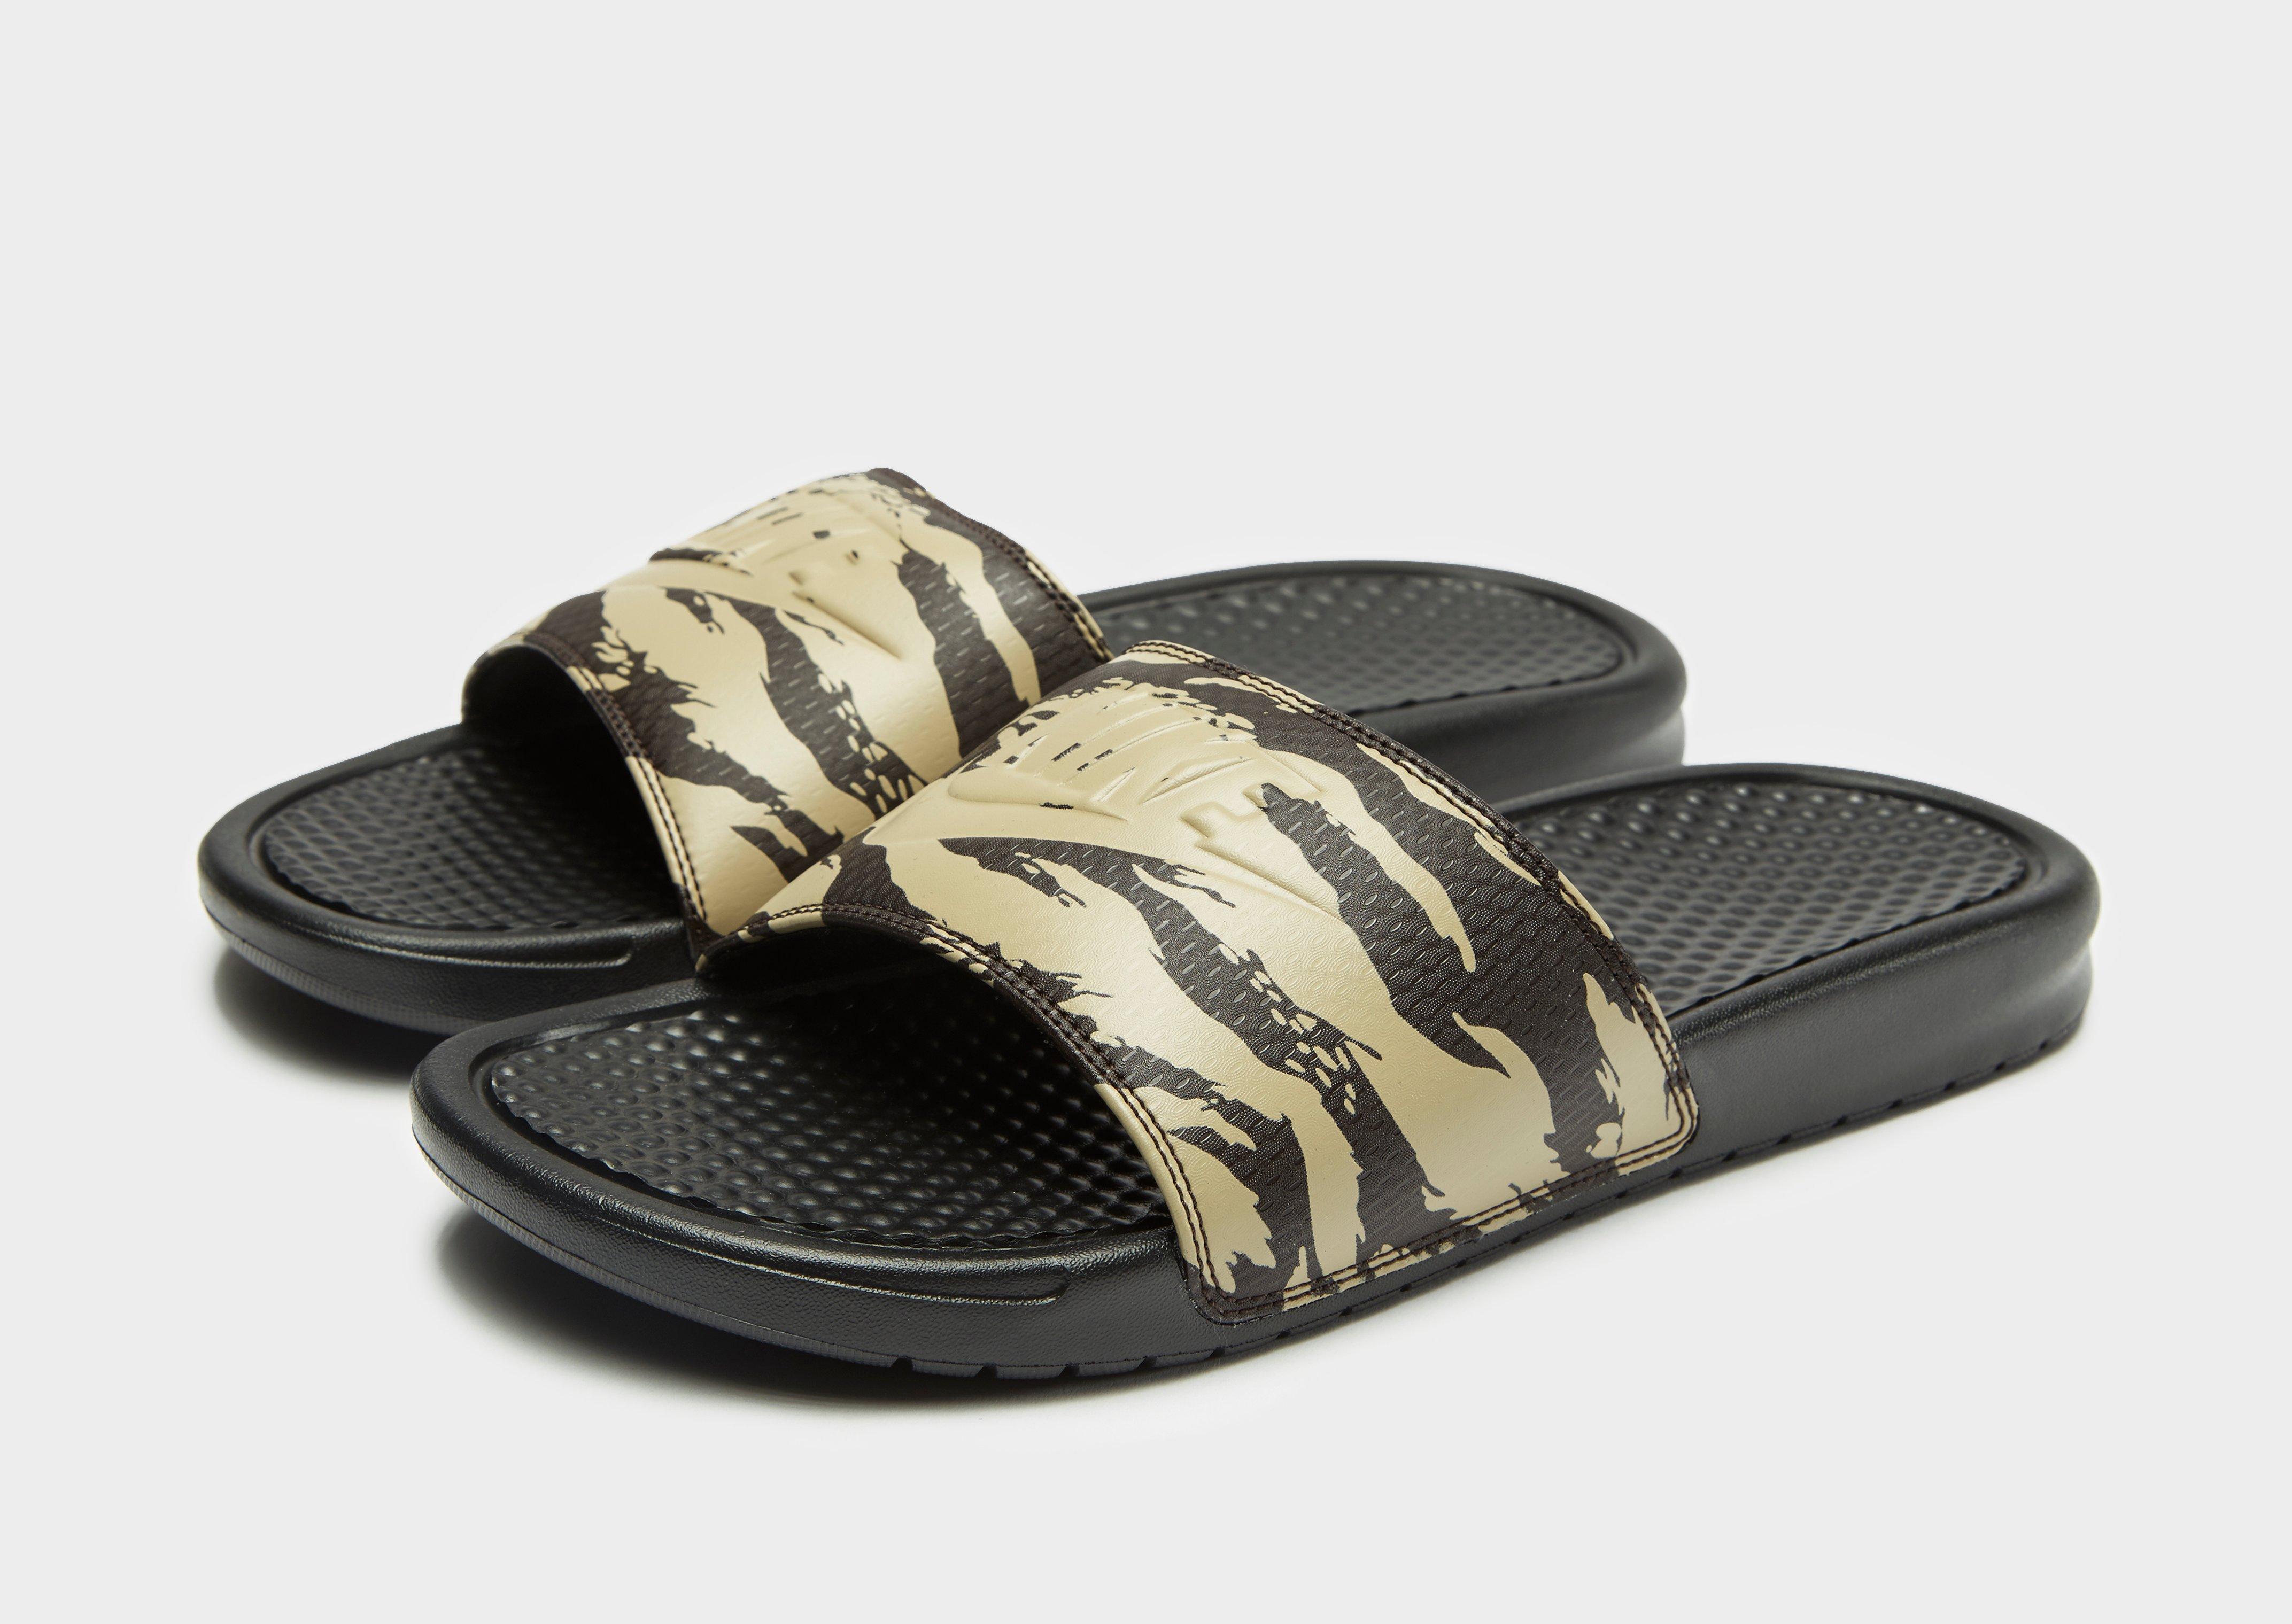 1bae3ea852bdb5 ... Reliable Nike Benassi Swoosh Slide Sandal Black Blue Camo 618312 400 Men  s Sandals Summer Slides  Nike Benassi Slides in Green for Men - Lyst ...